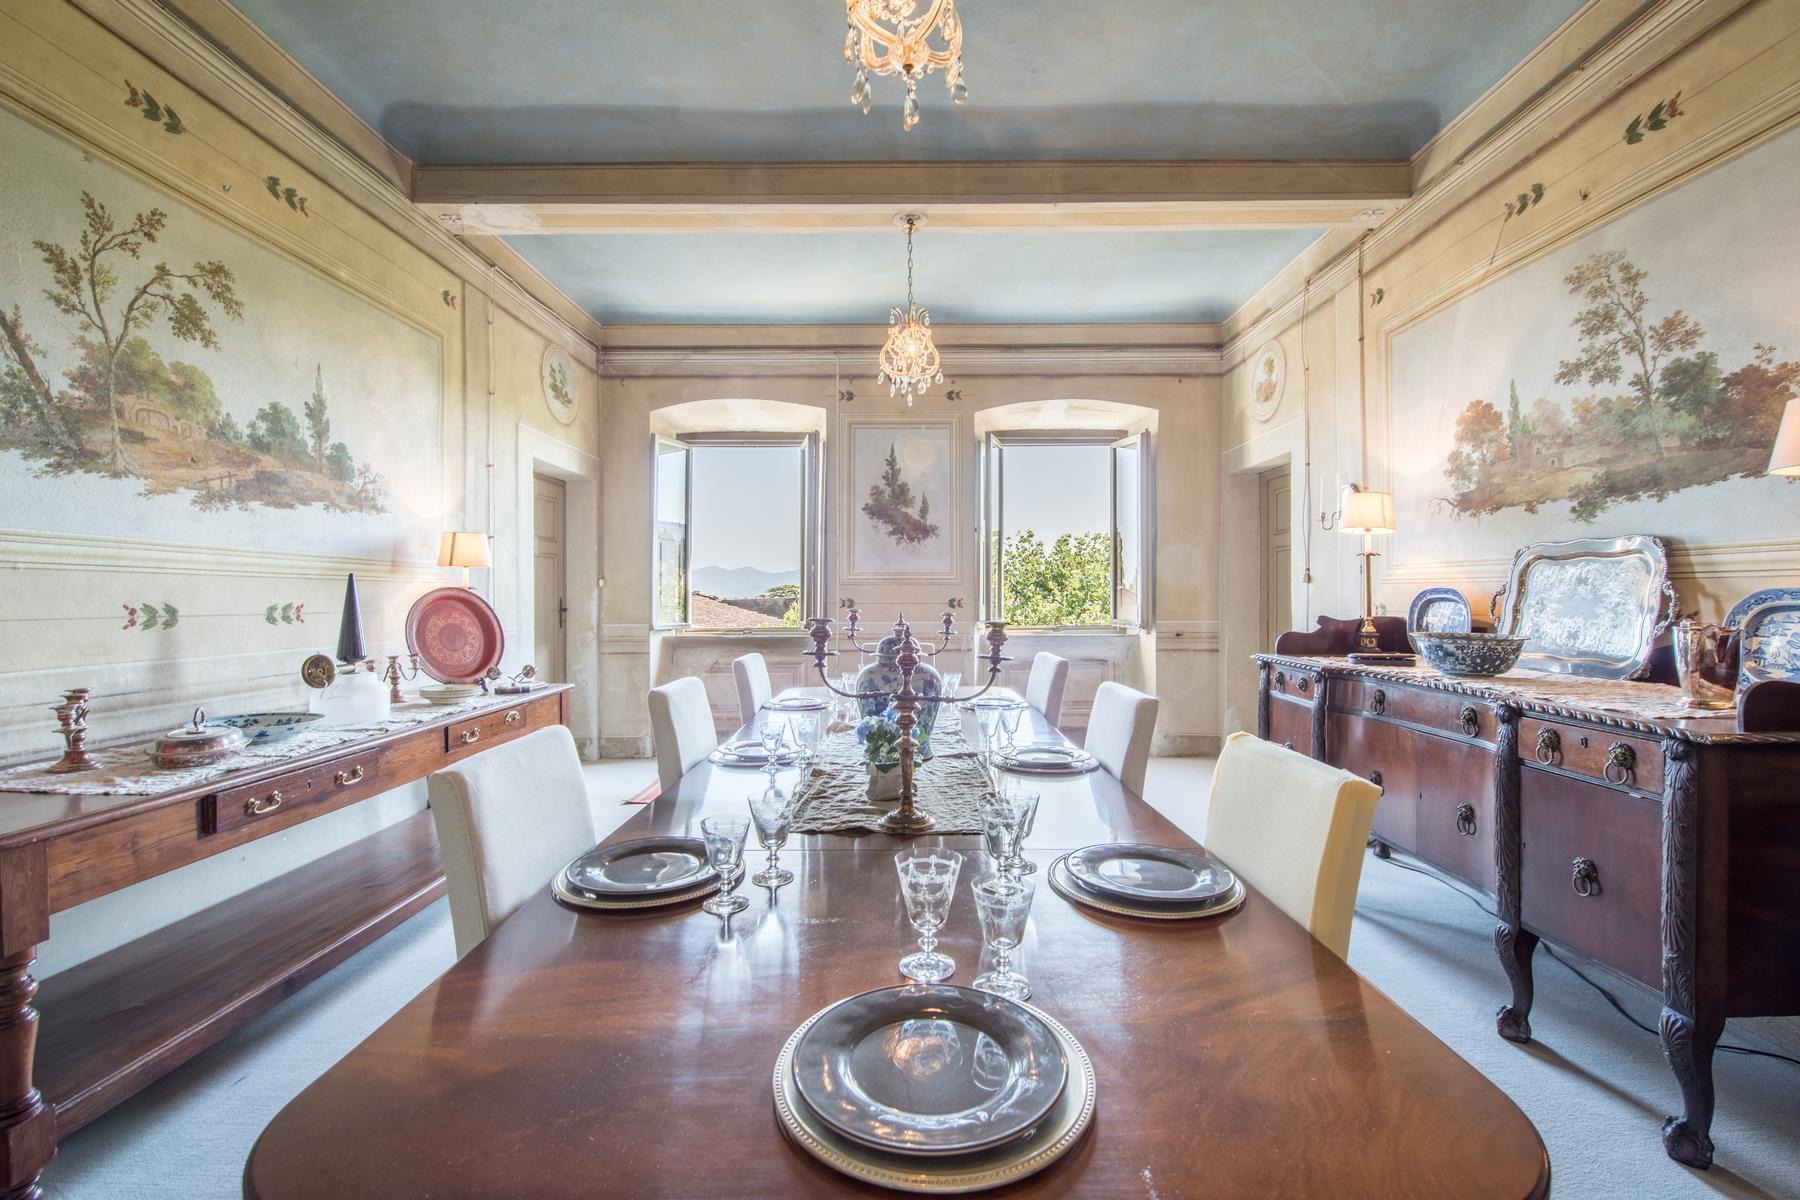 Villa in Vendita a Lucca: 5 locali, 2500 mq - Foto 4